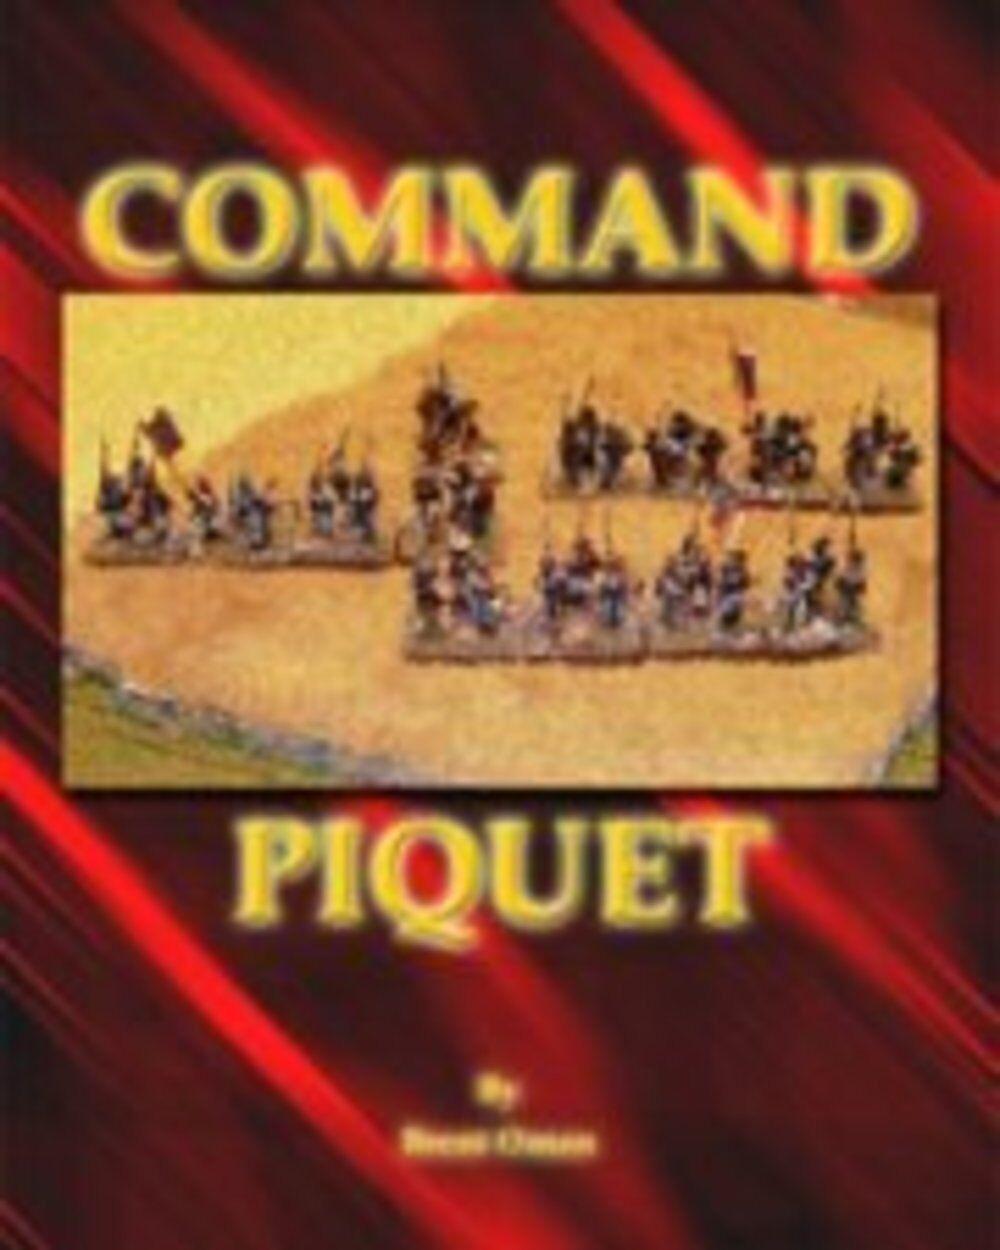 COMMAND PIQUET 1700-1900 A.D - WARGAMES RULES - NEW